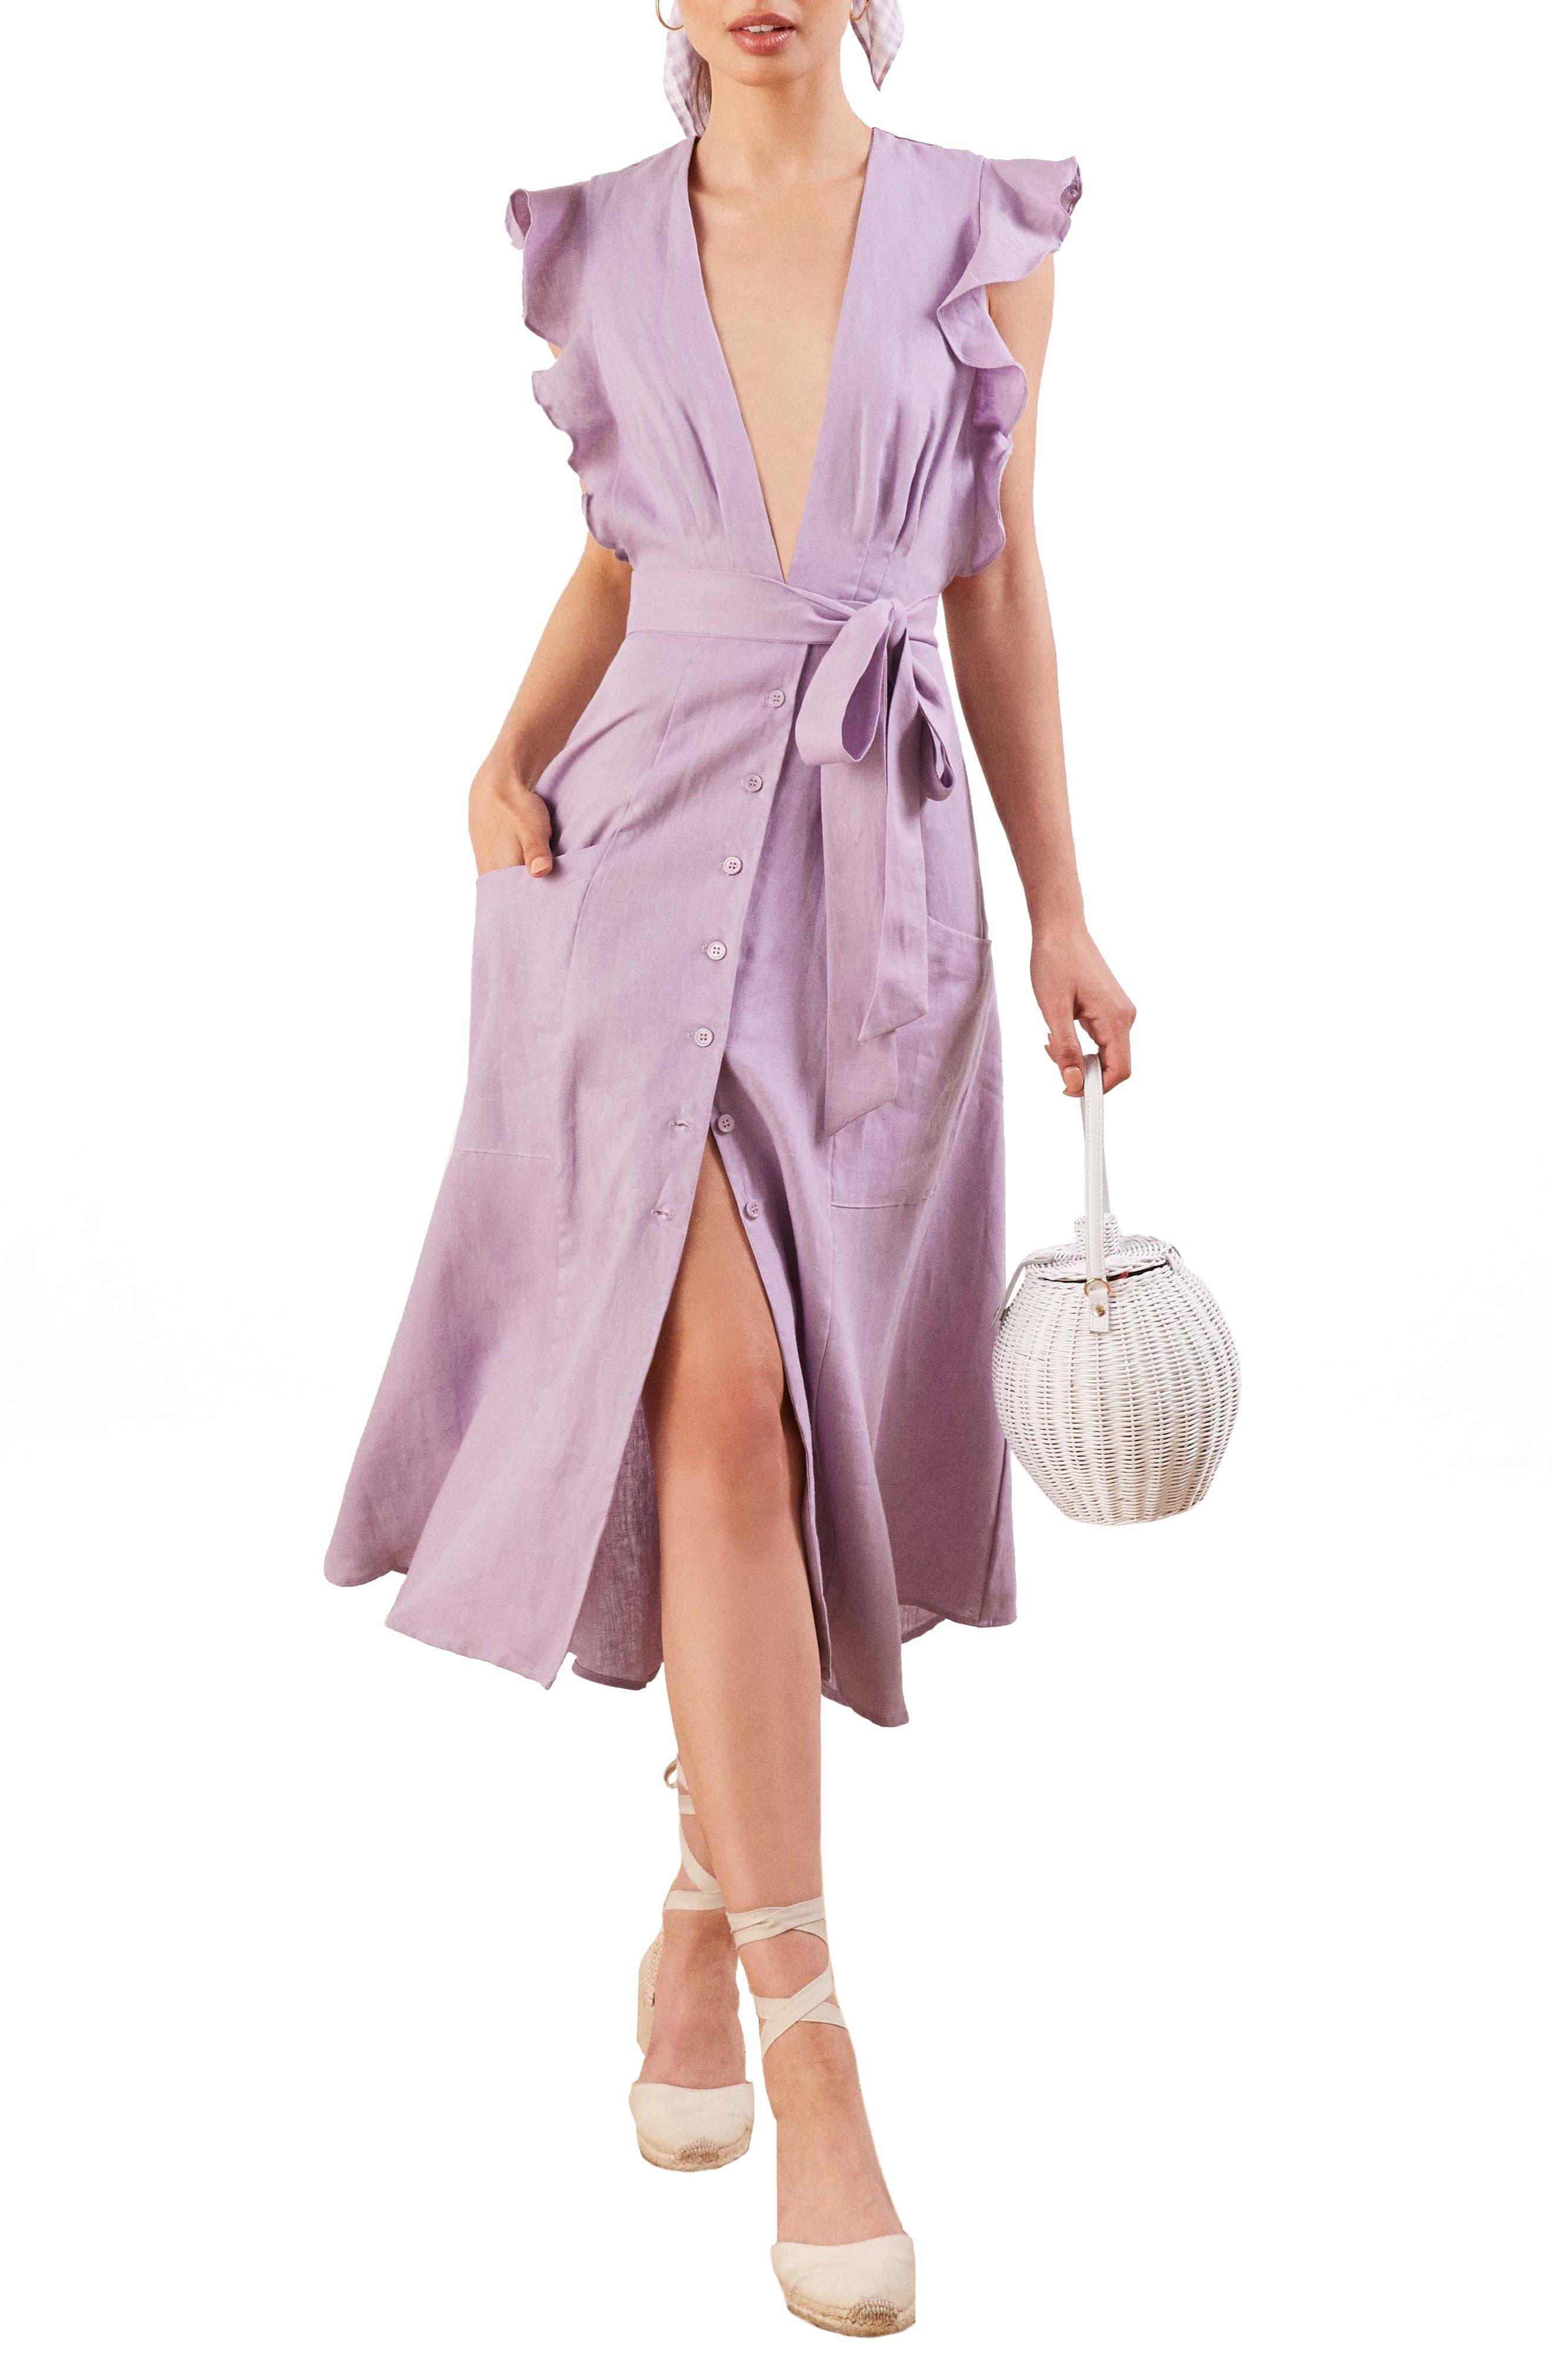 Serengeti Linen Dress,                         Main,                         color, 500